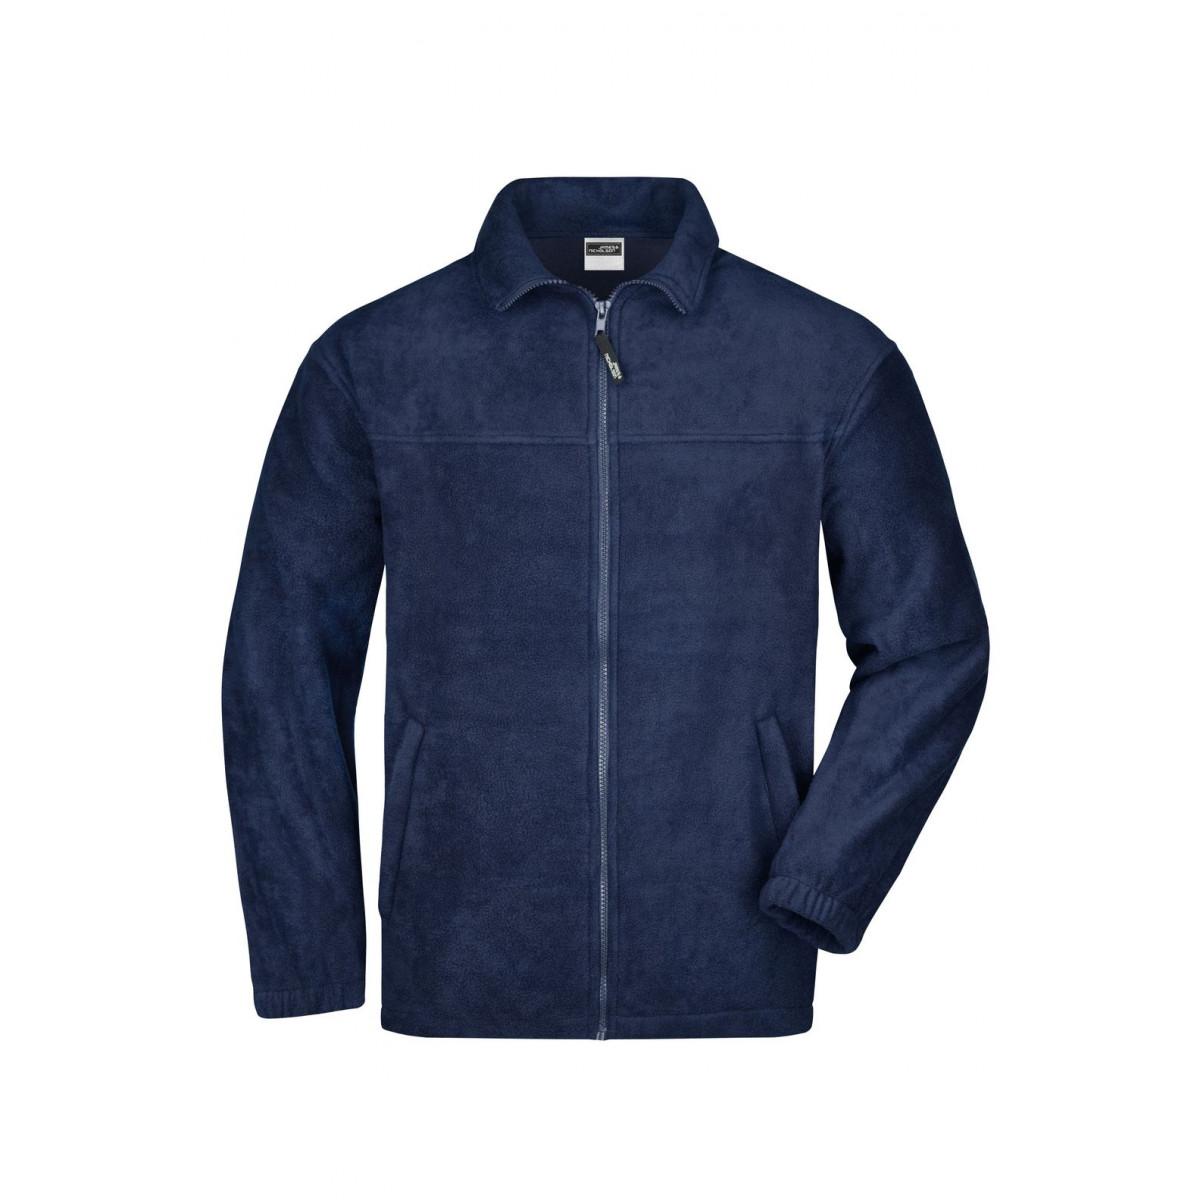 Толстовка мужская JN044 Full-Zip Fleece - Темно-синий